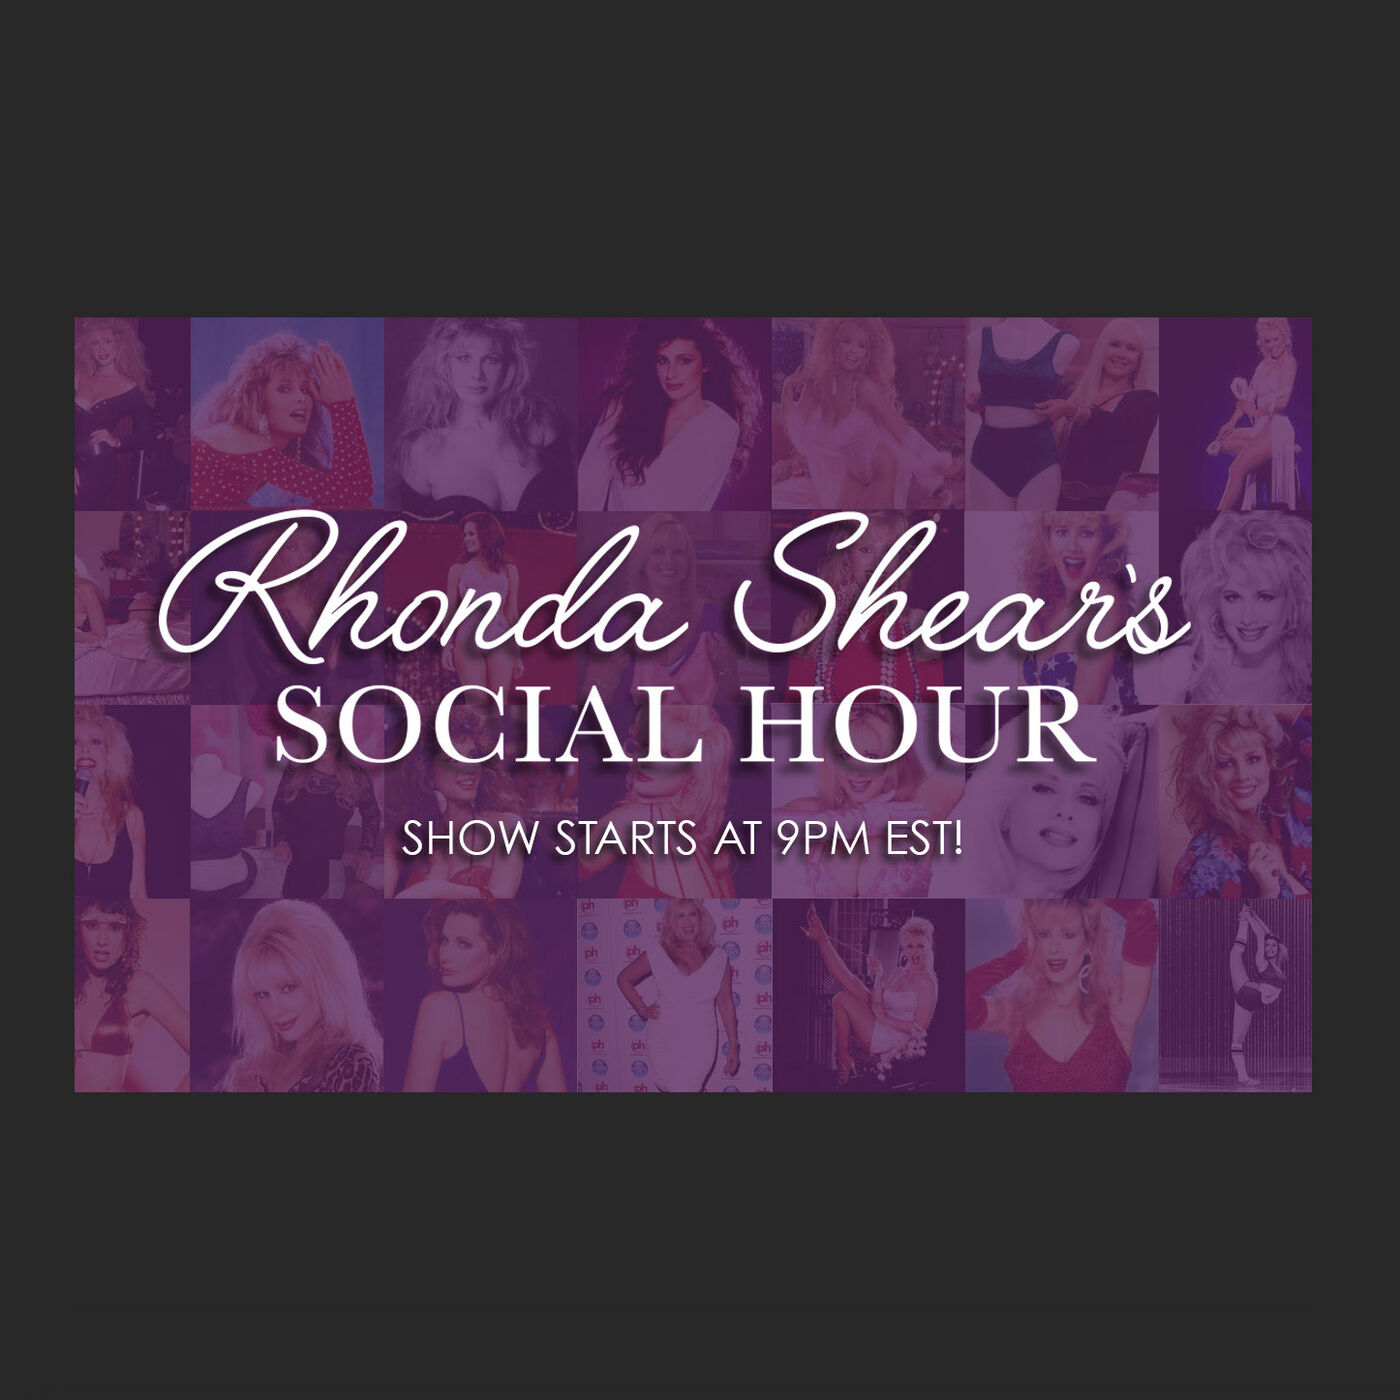 Rhonda Shear Social Hour #1 2020 - Gilbert Godfrey, Traci Bingham and Linnea Quigley